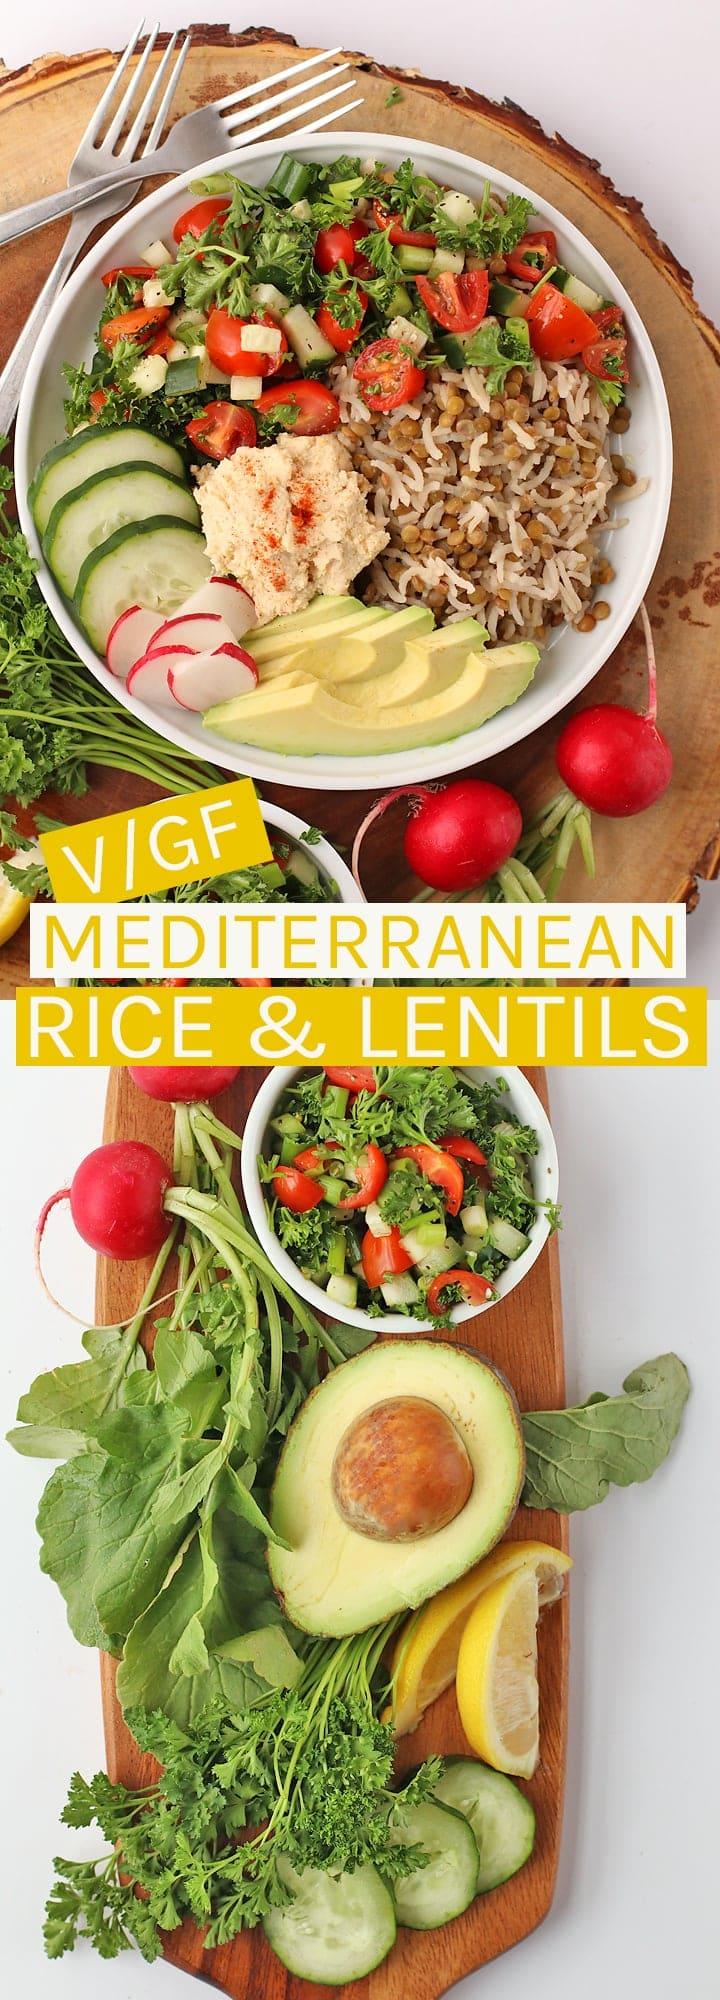 Enjoy this refreshing vegan and gluten-free Mediterranean Rice & Lentils made with fresh cucumber salad and homemade hummus.